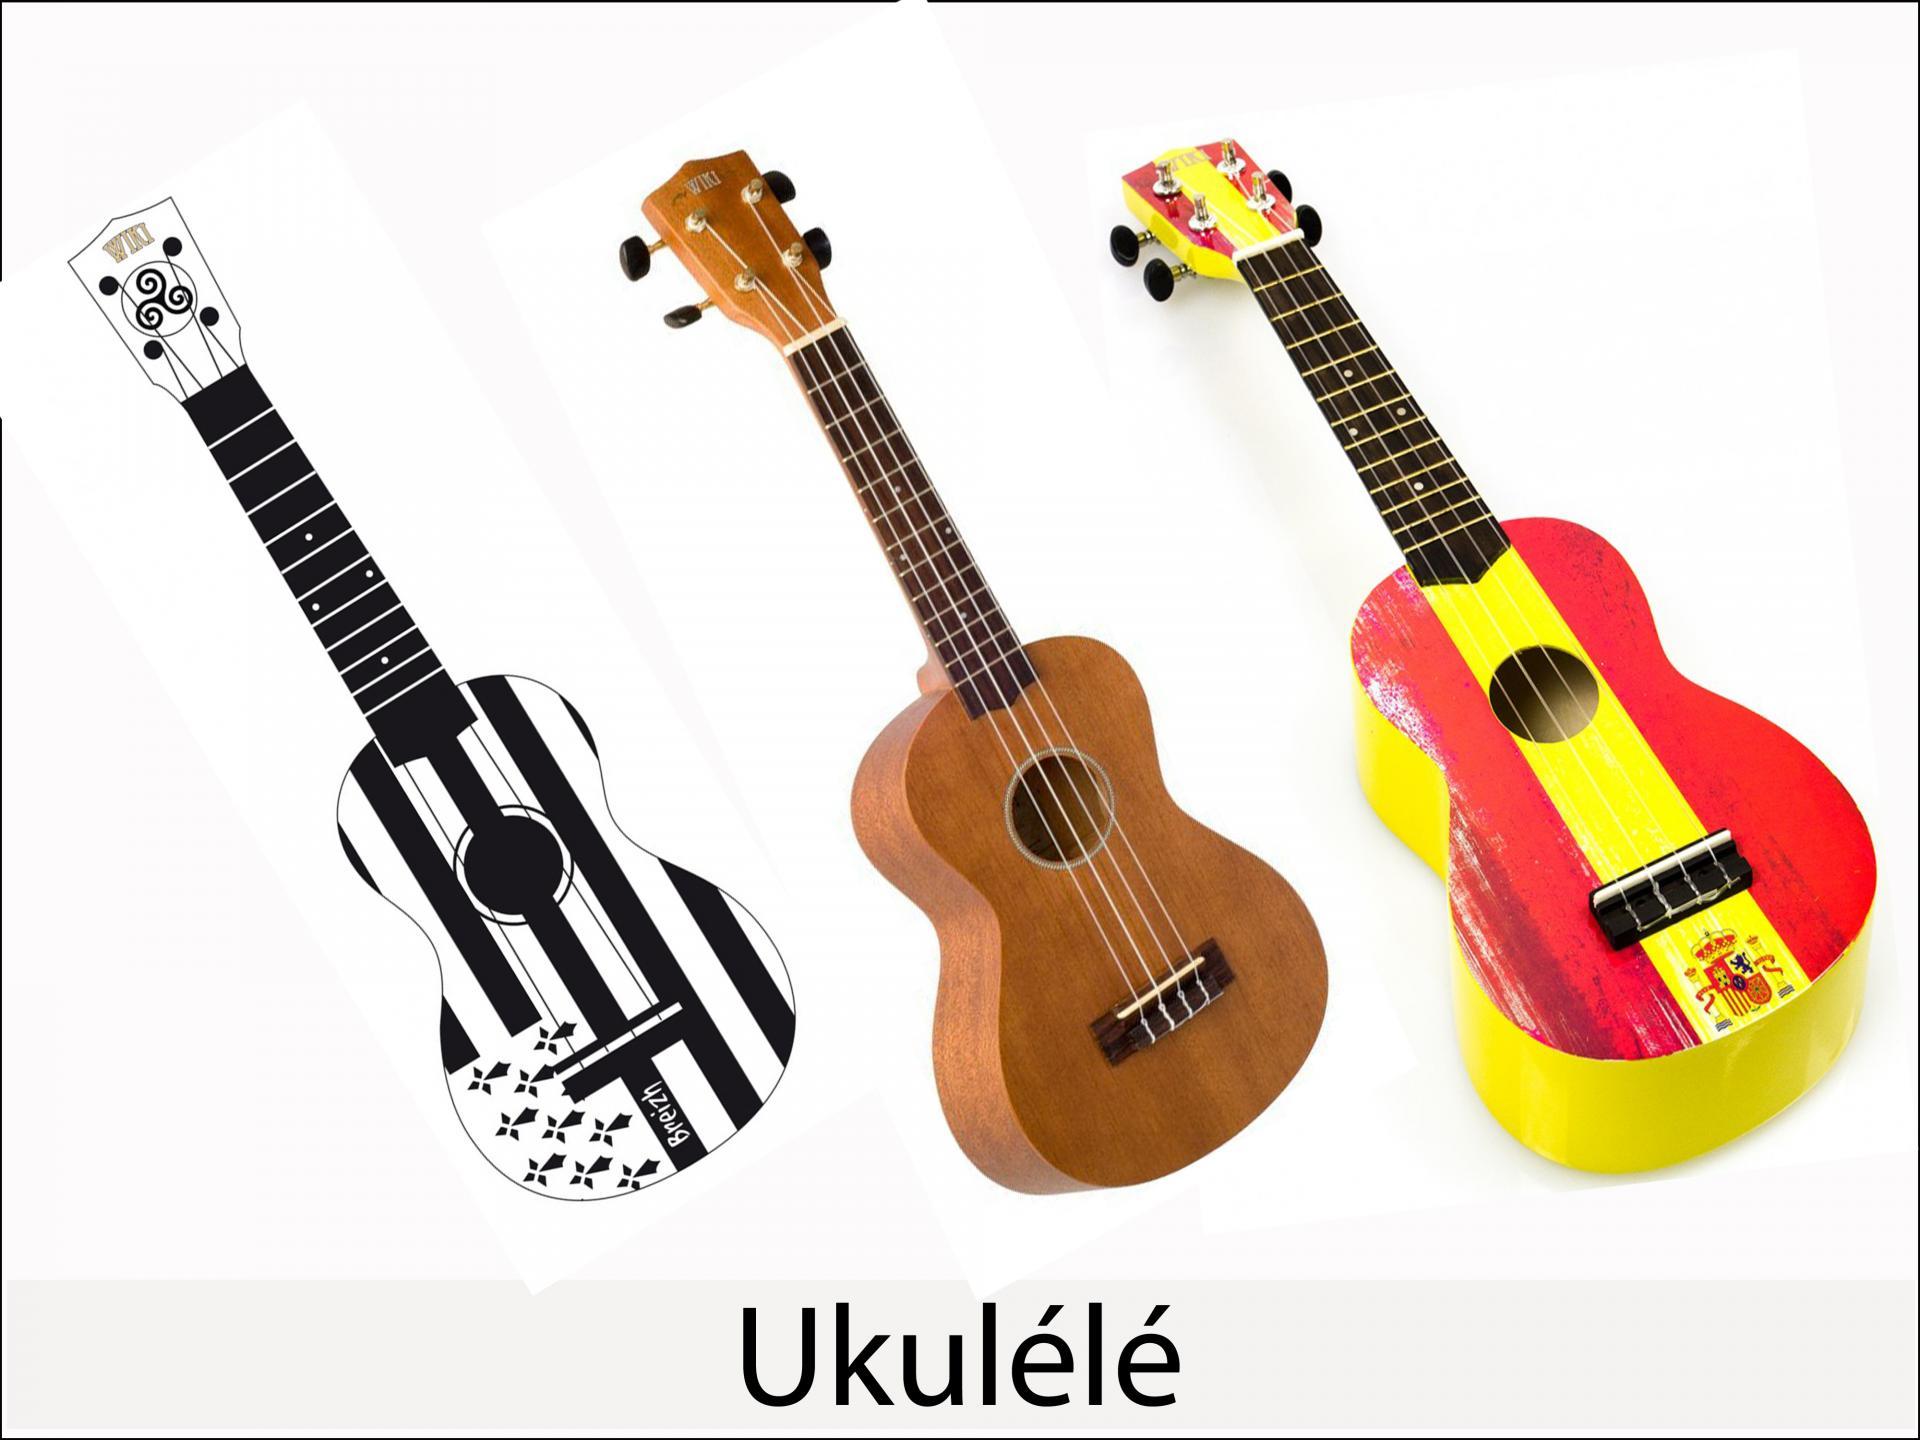 Acceuil carre ukulele